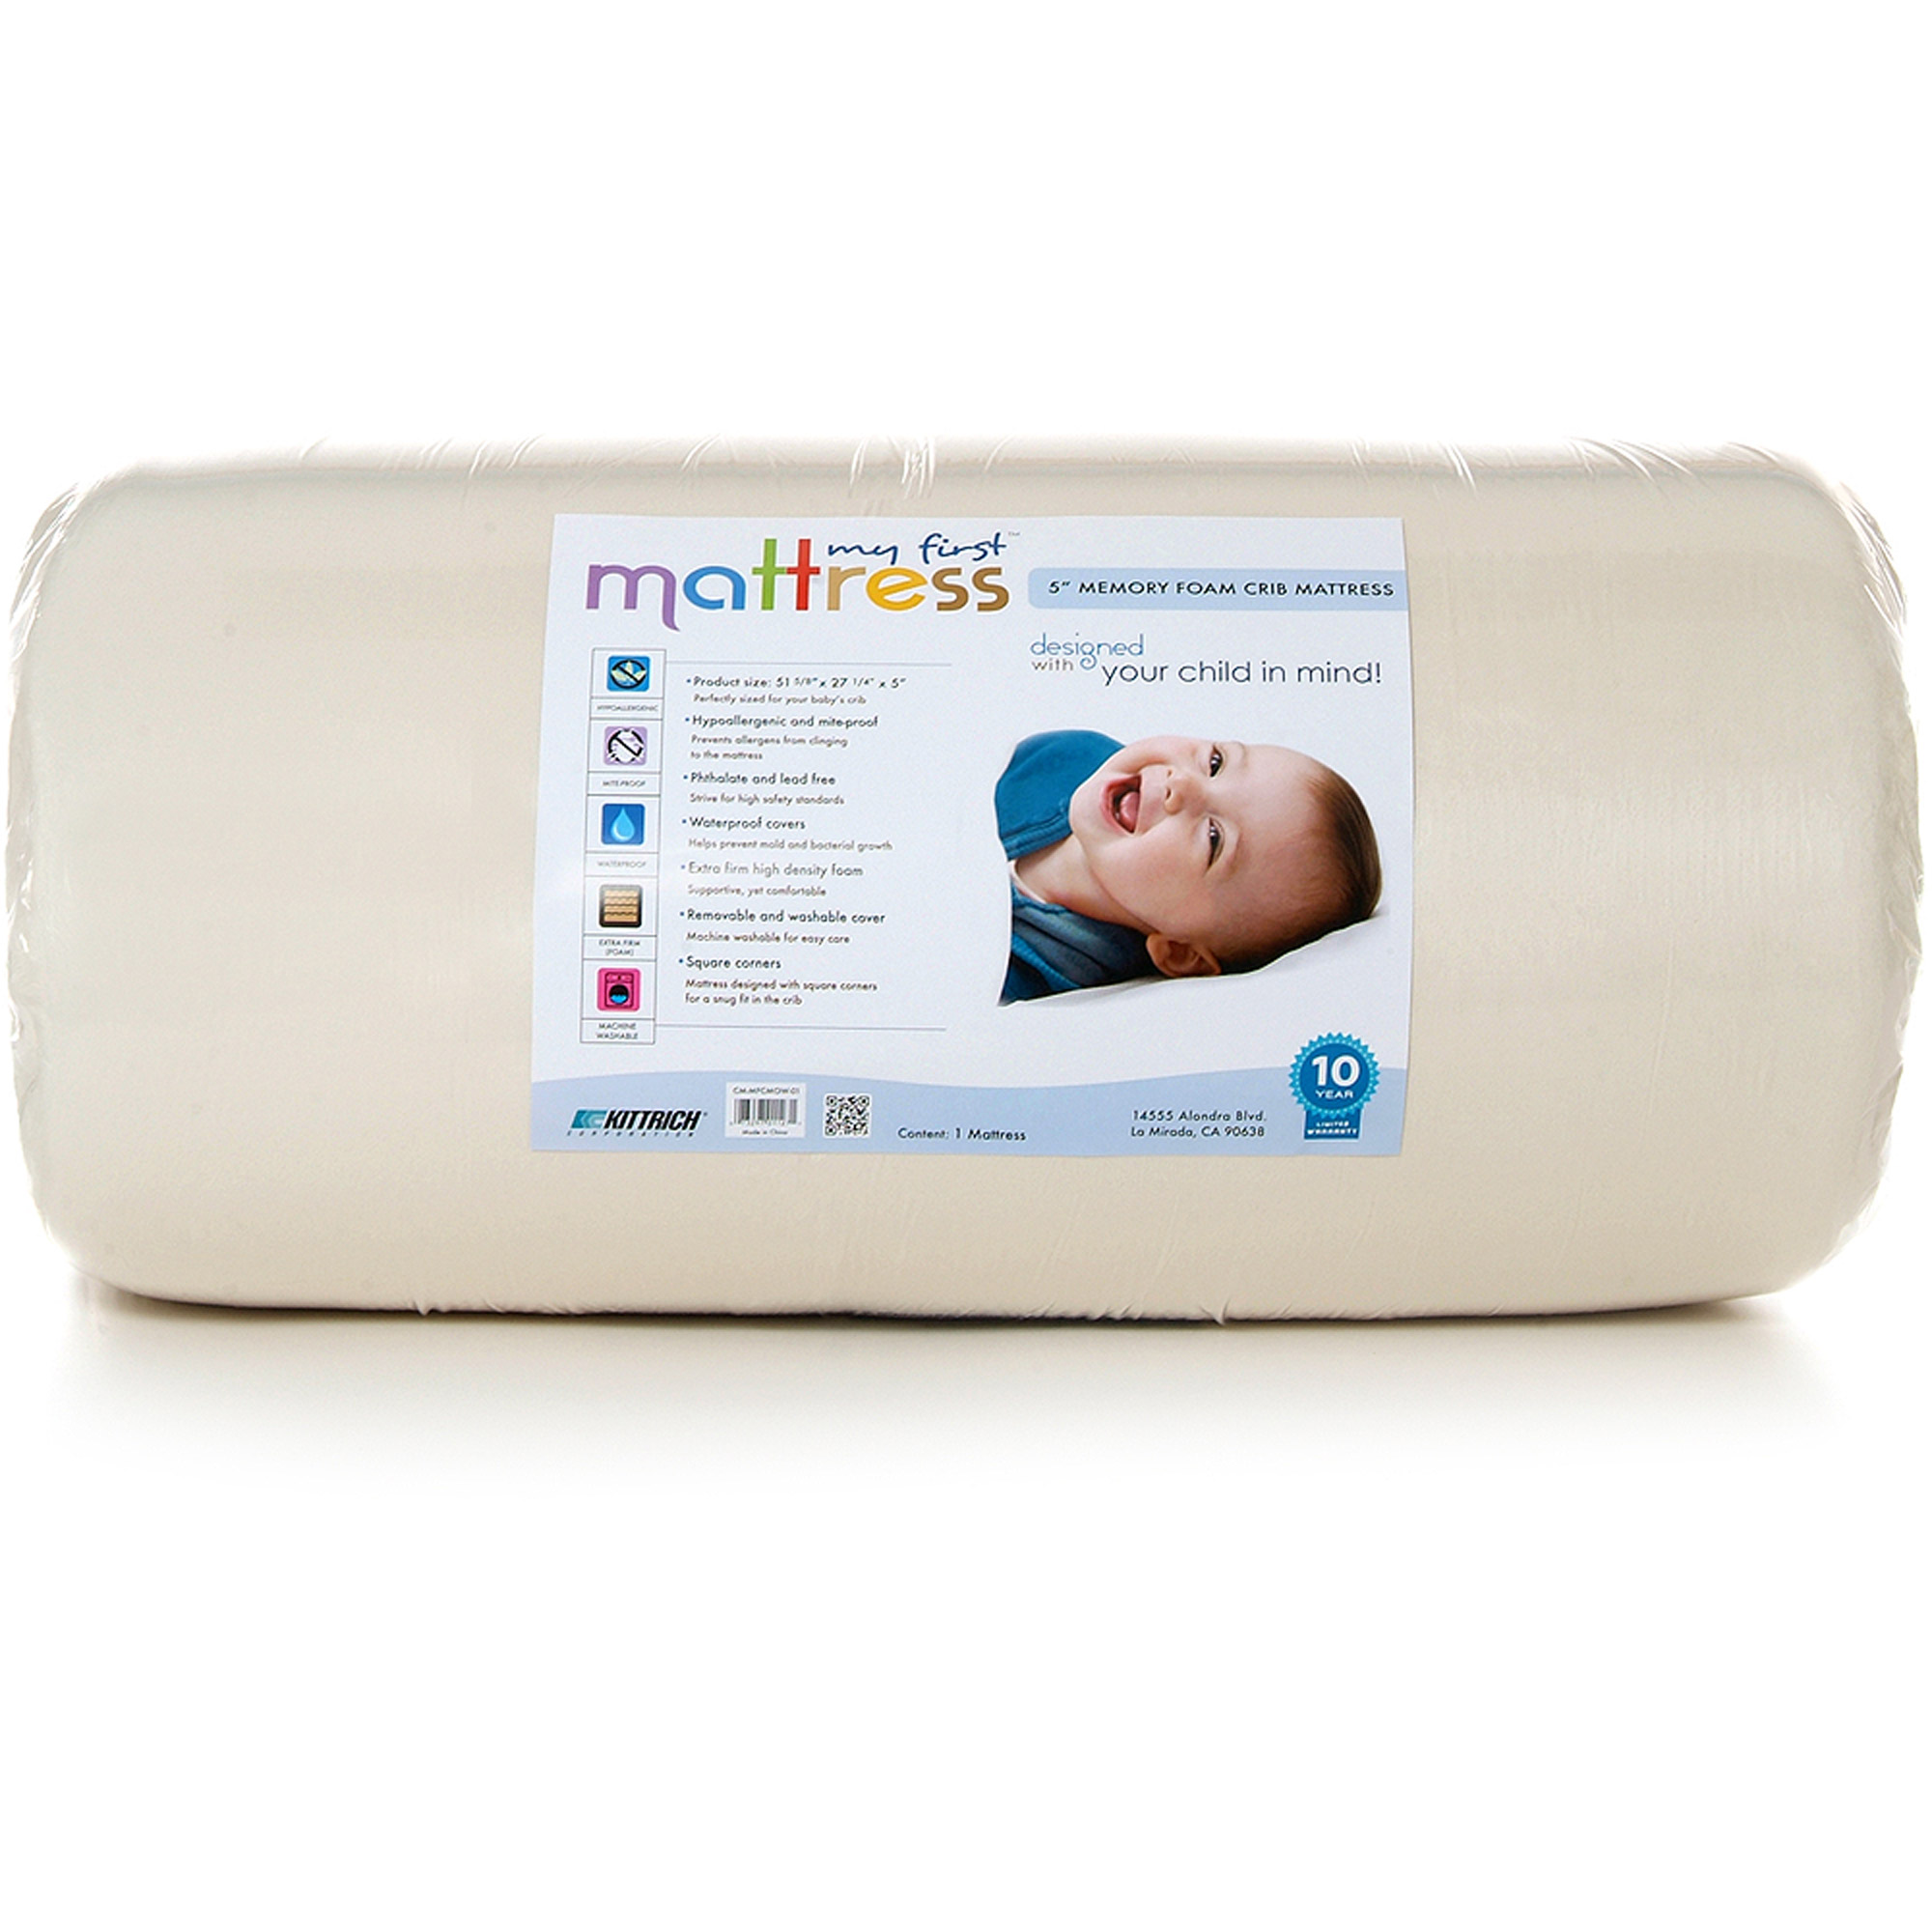 my first crib mattress, memory foam crib mattress, removable